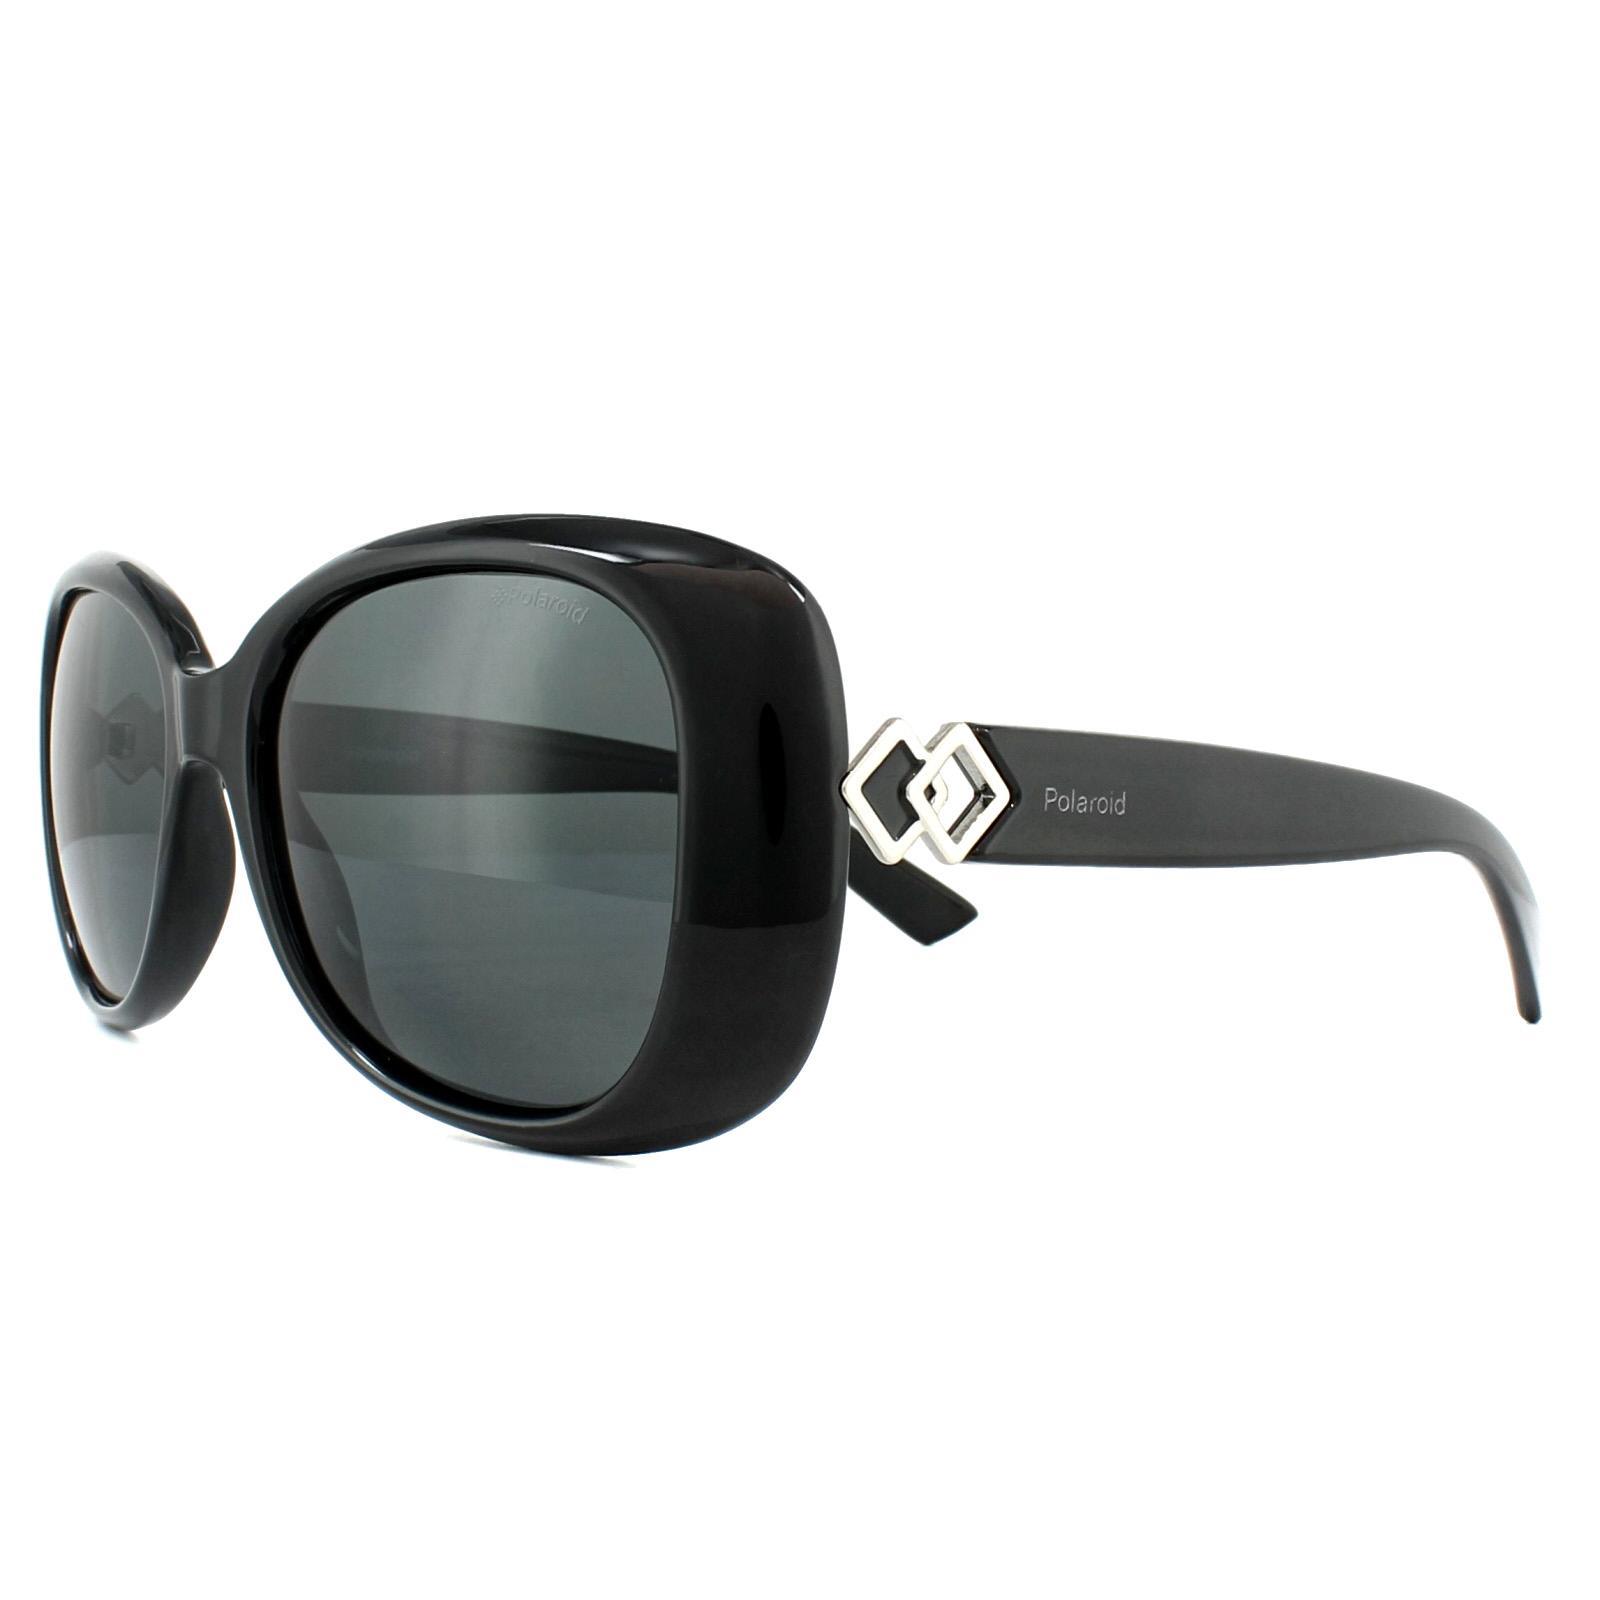 NEW Polaroid PLD6080GCS-08AM9 PLD6080GCS-08AM9 Black Grey Sunglasses